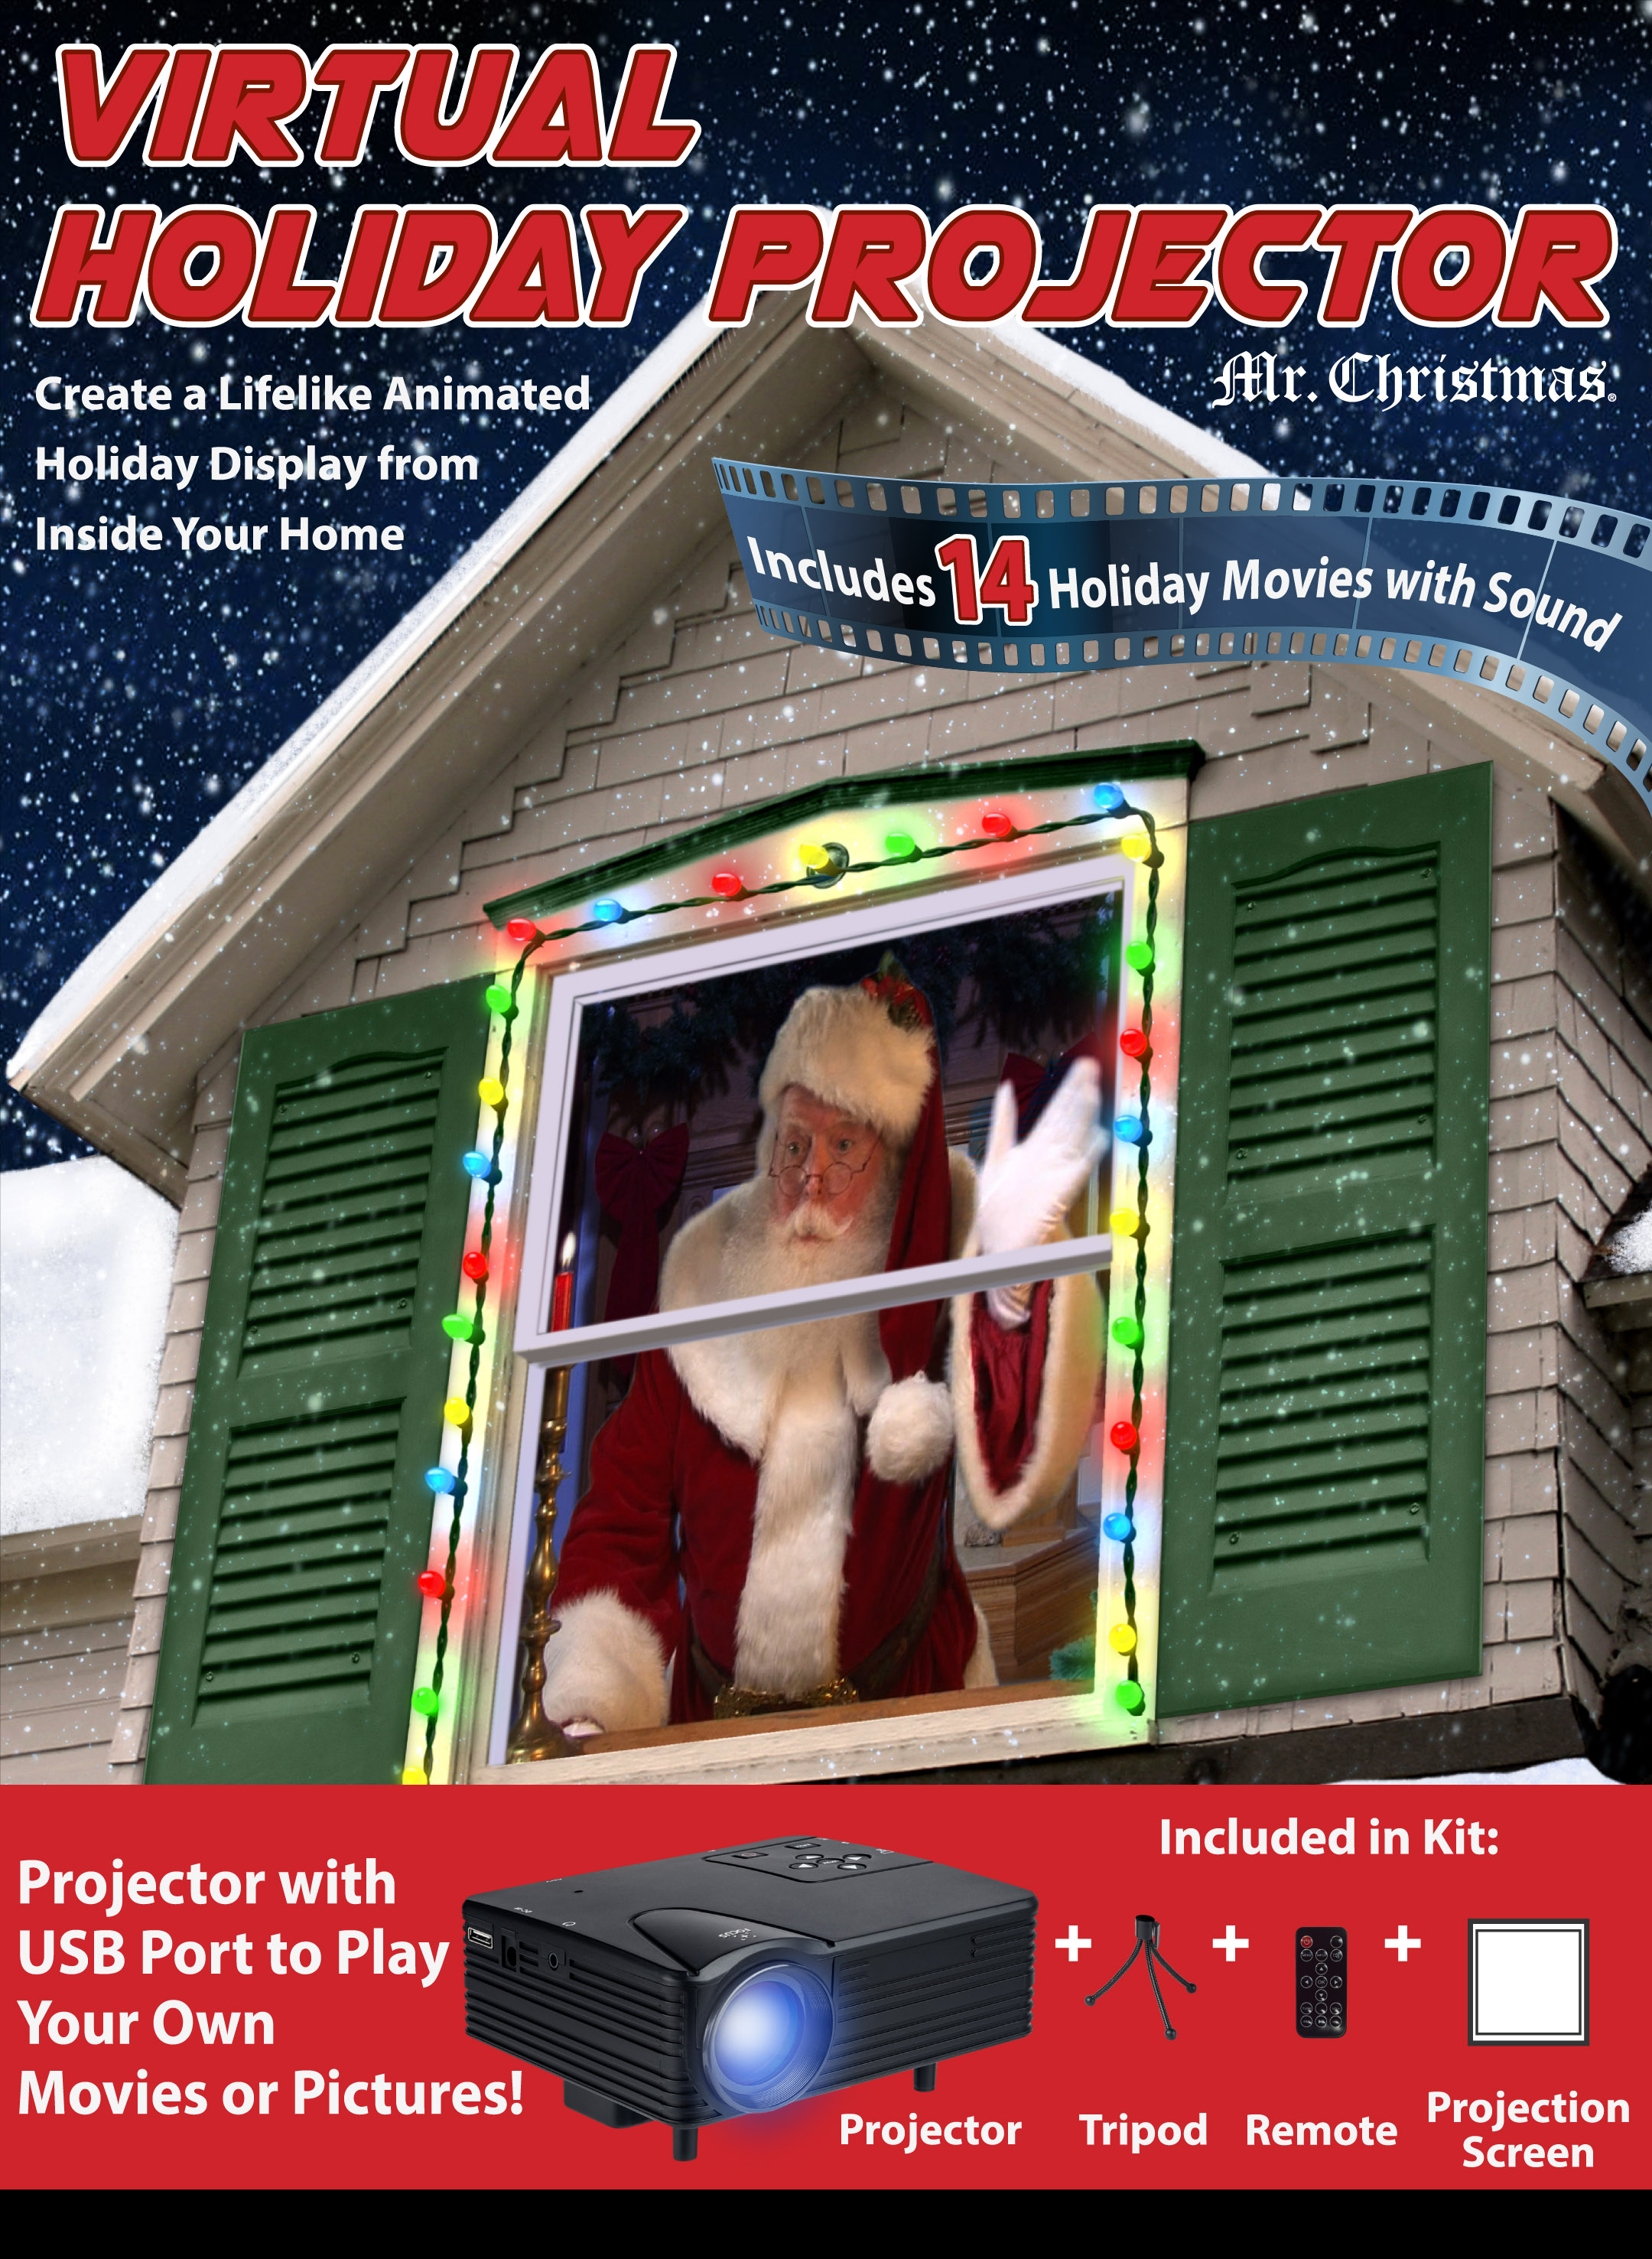 Mr. Christmas Indoor Virtual Holiday Projector - Walmart.com